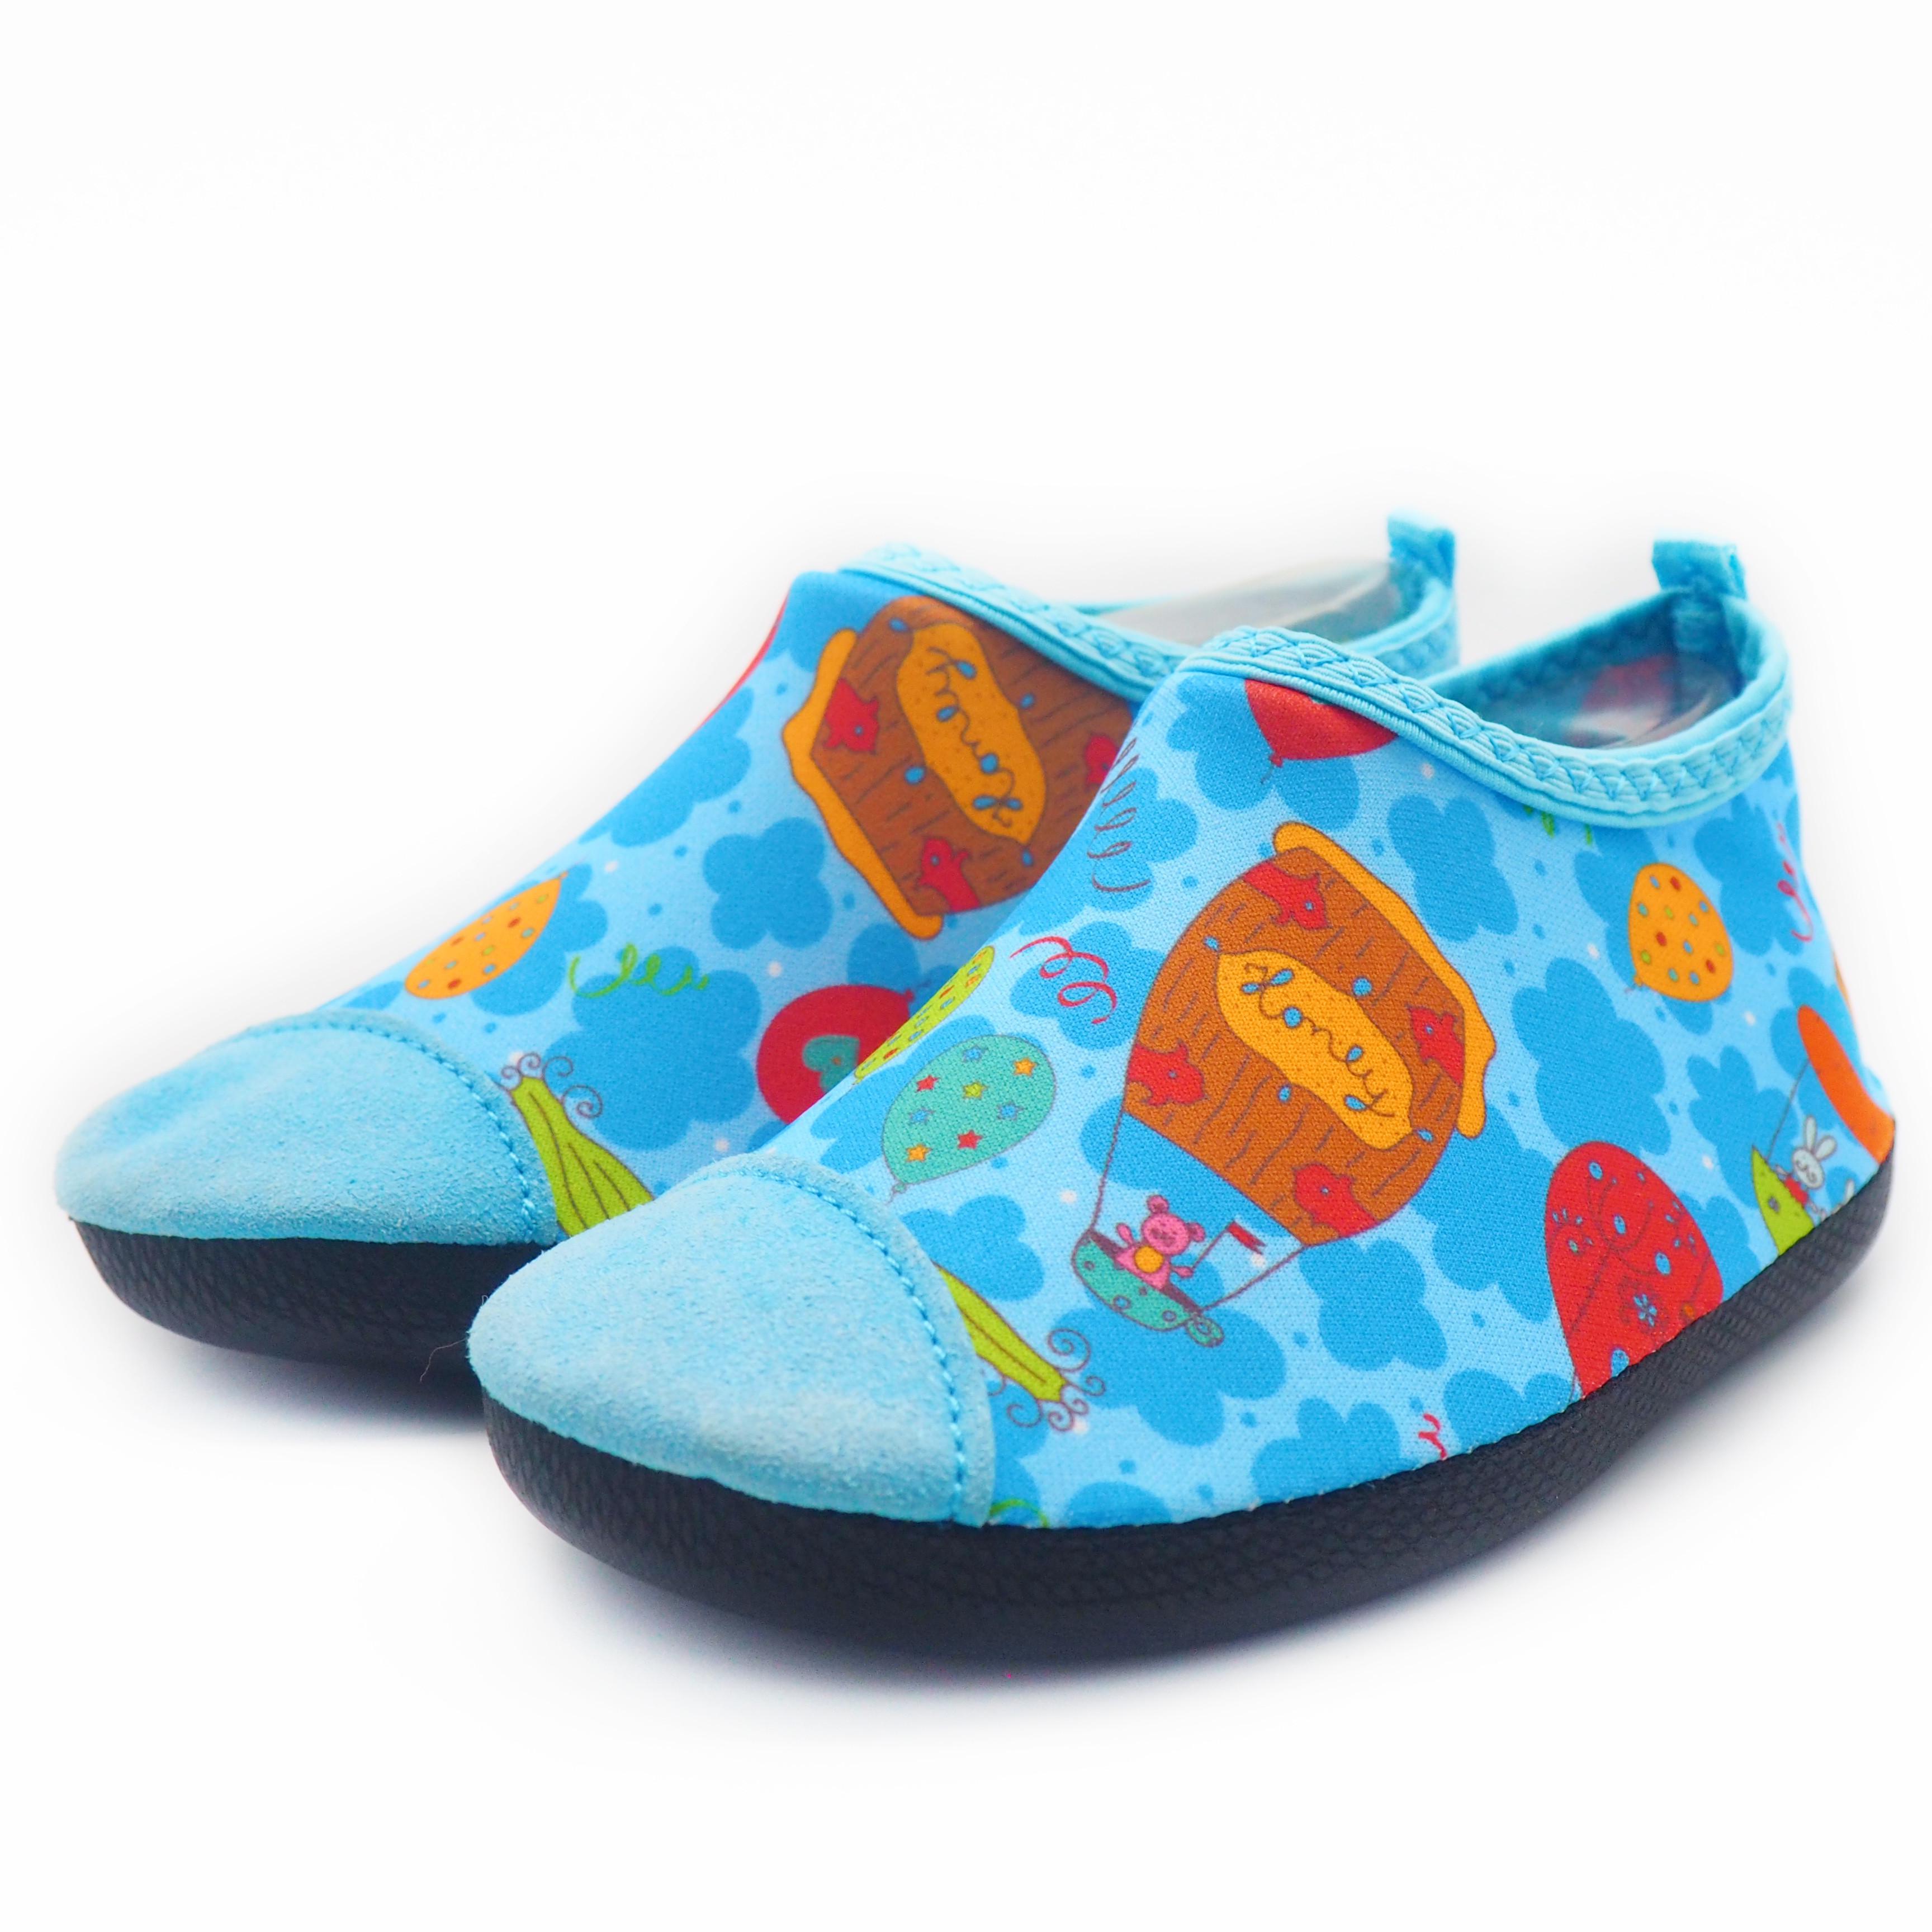 4ce21bee25c6 Lightweight Childrens Aqua Shoes Anti - Slip Waterproof Footwear For ...